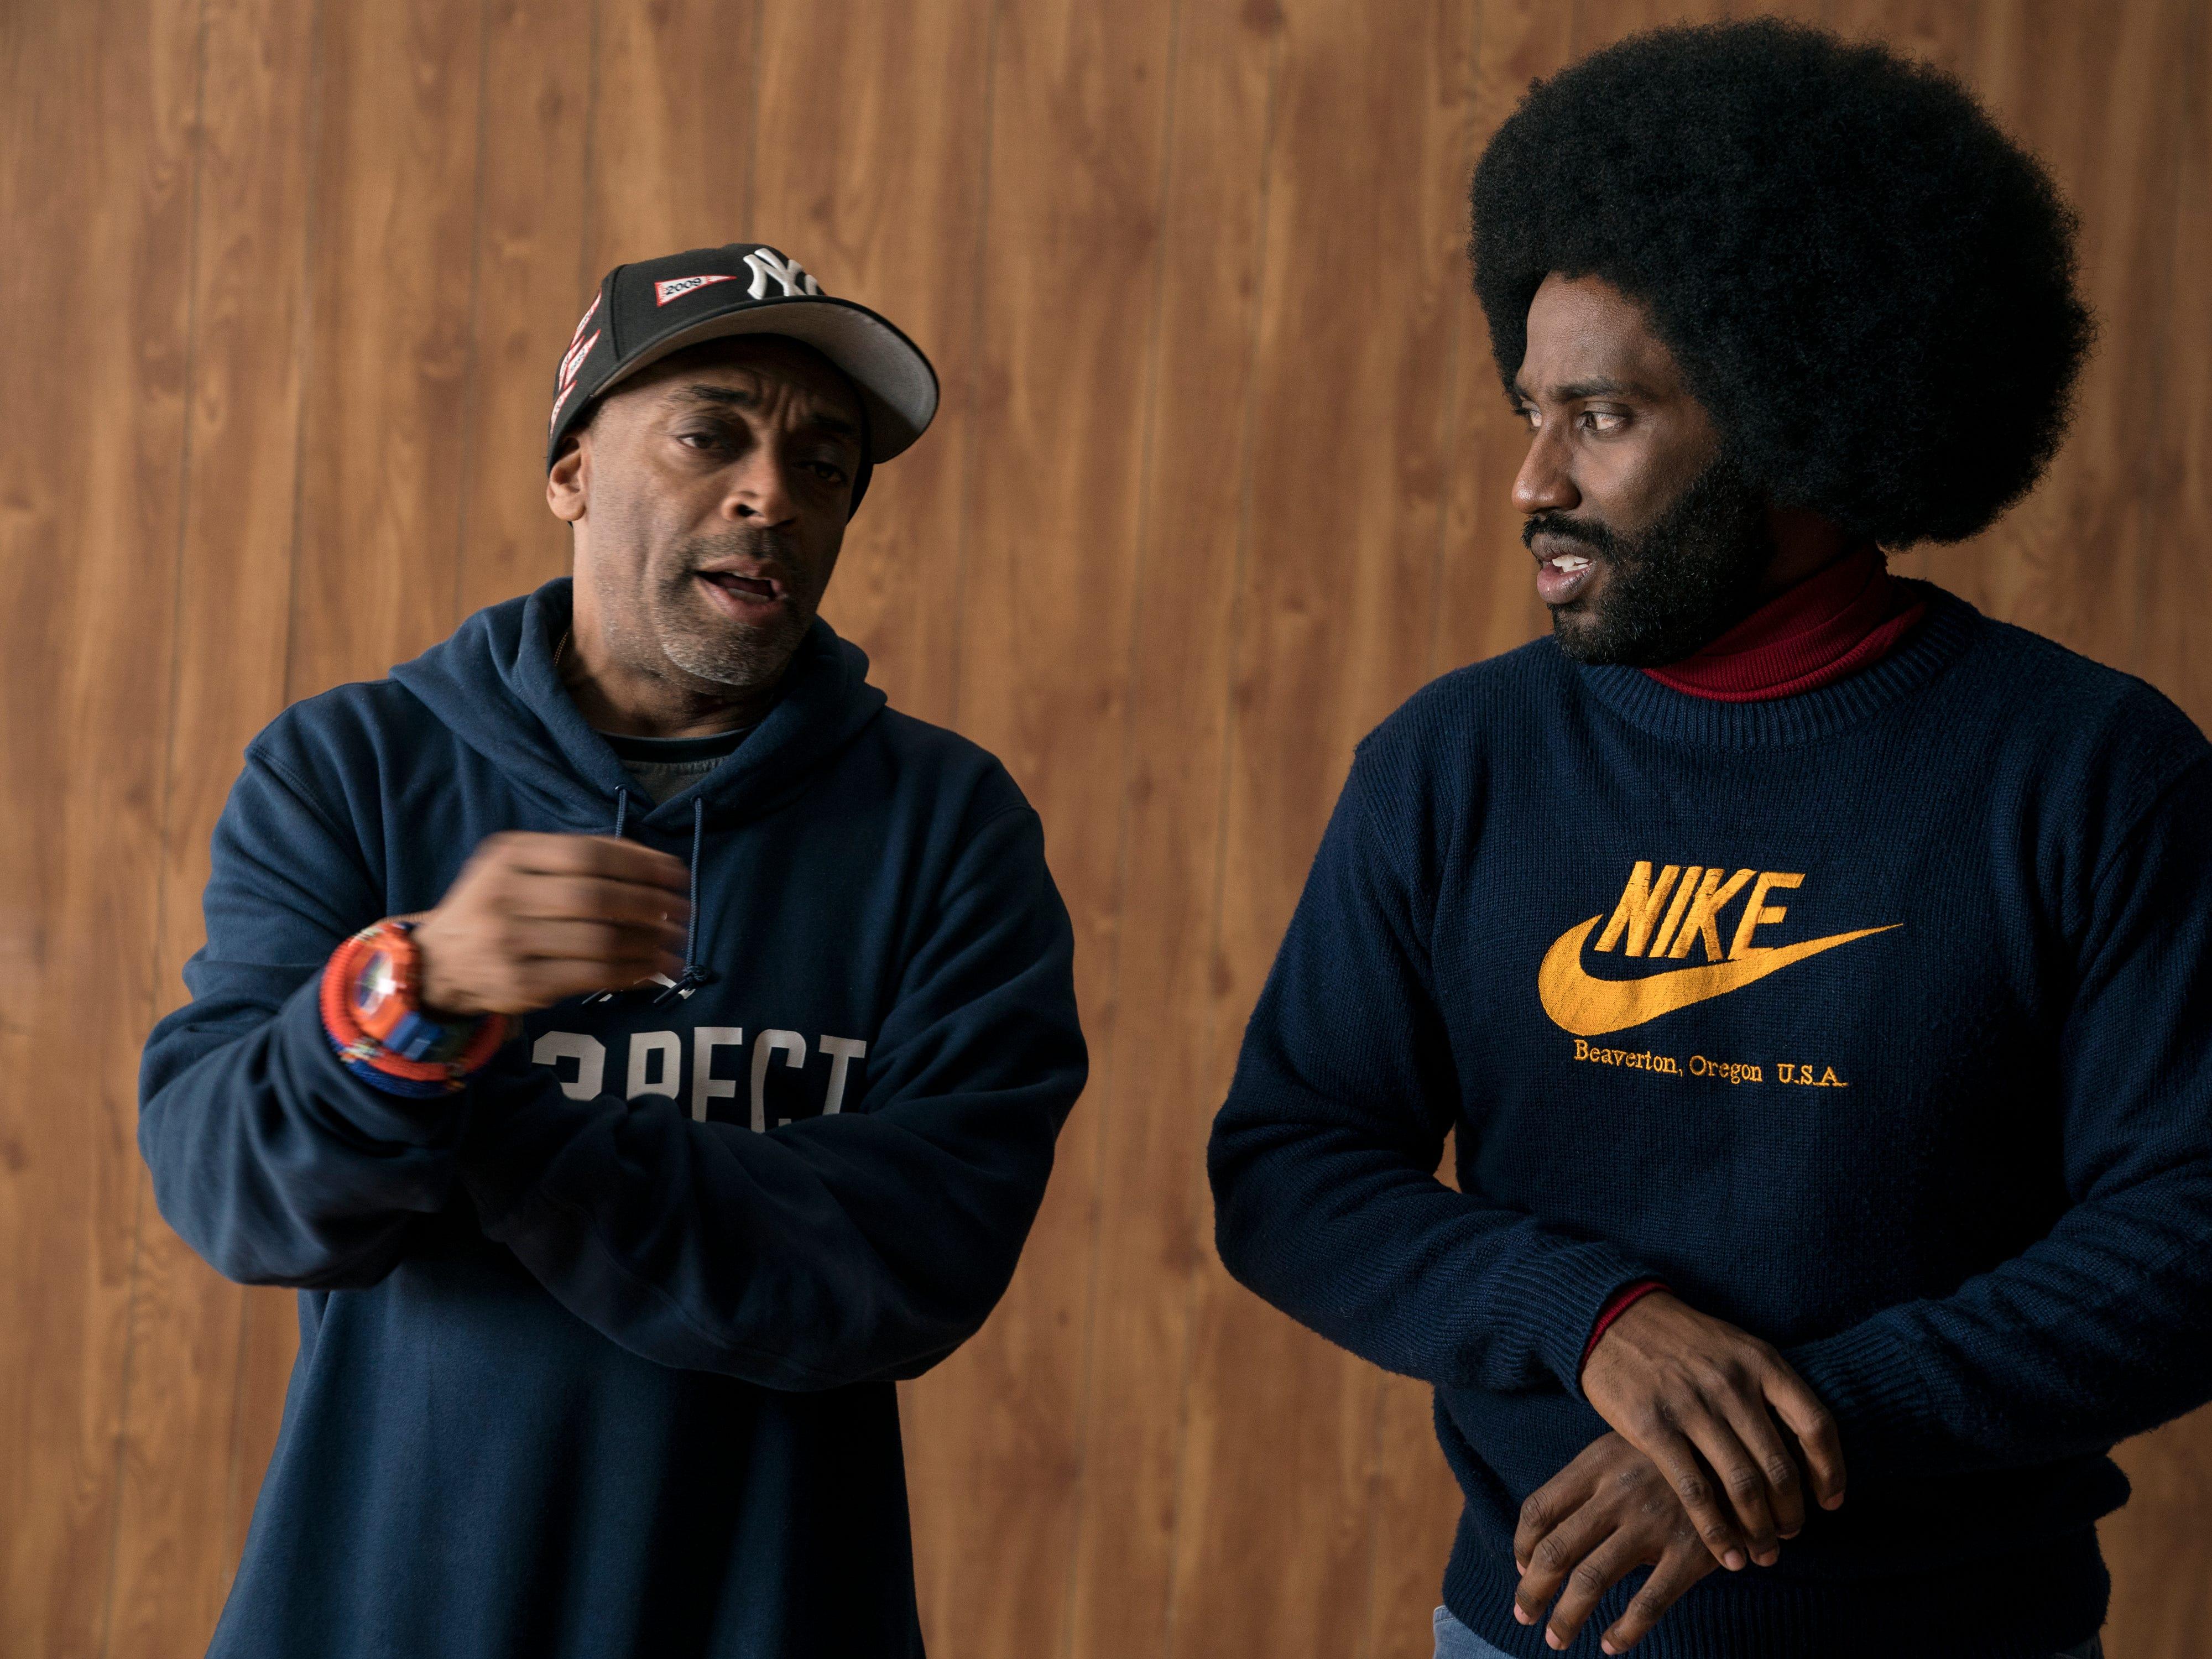 BlacKkKlansman: John David Washington, star of new Spike Lee film, talks being cast, race